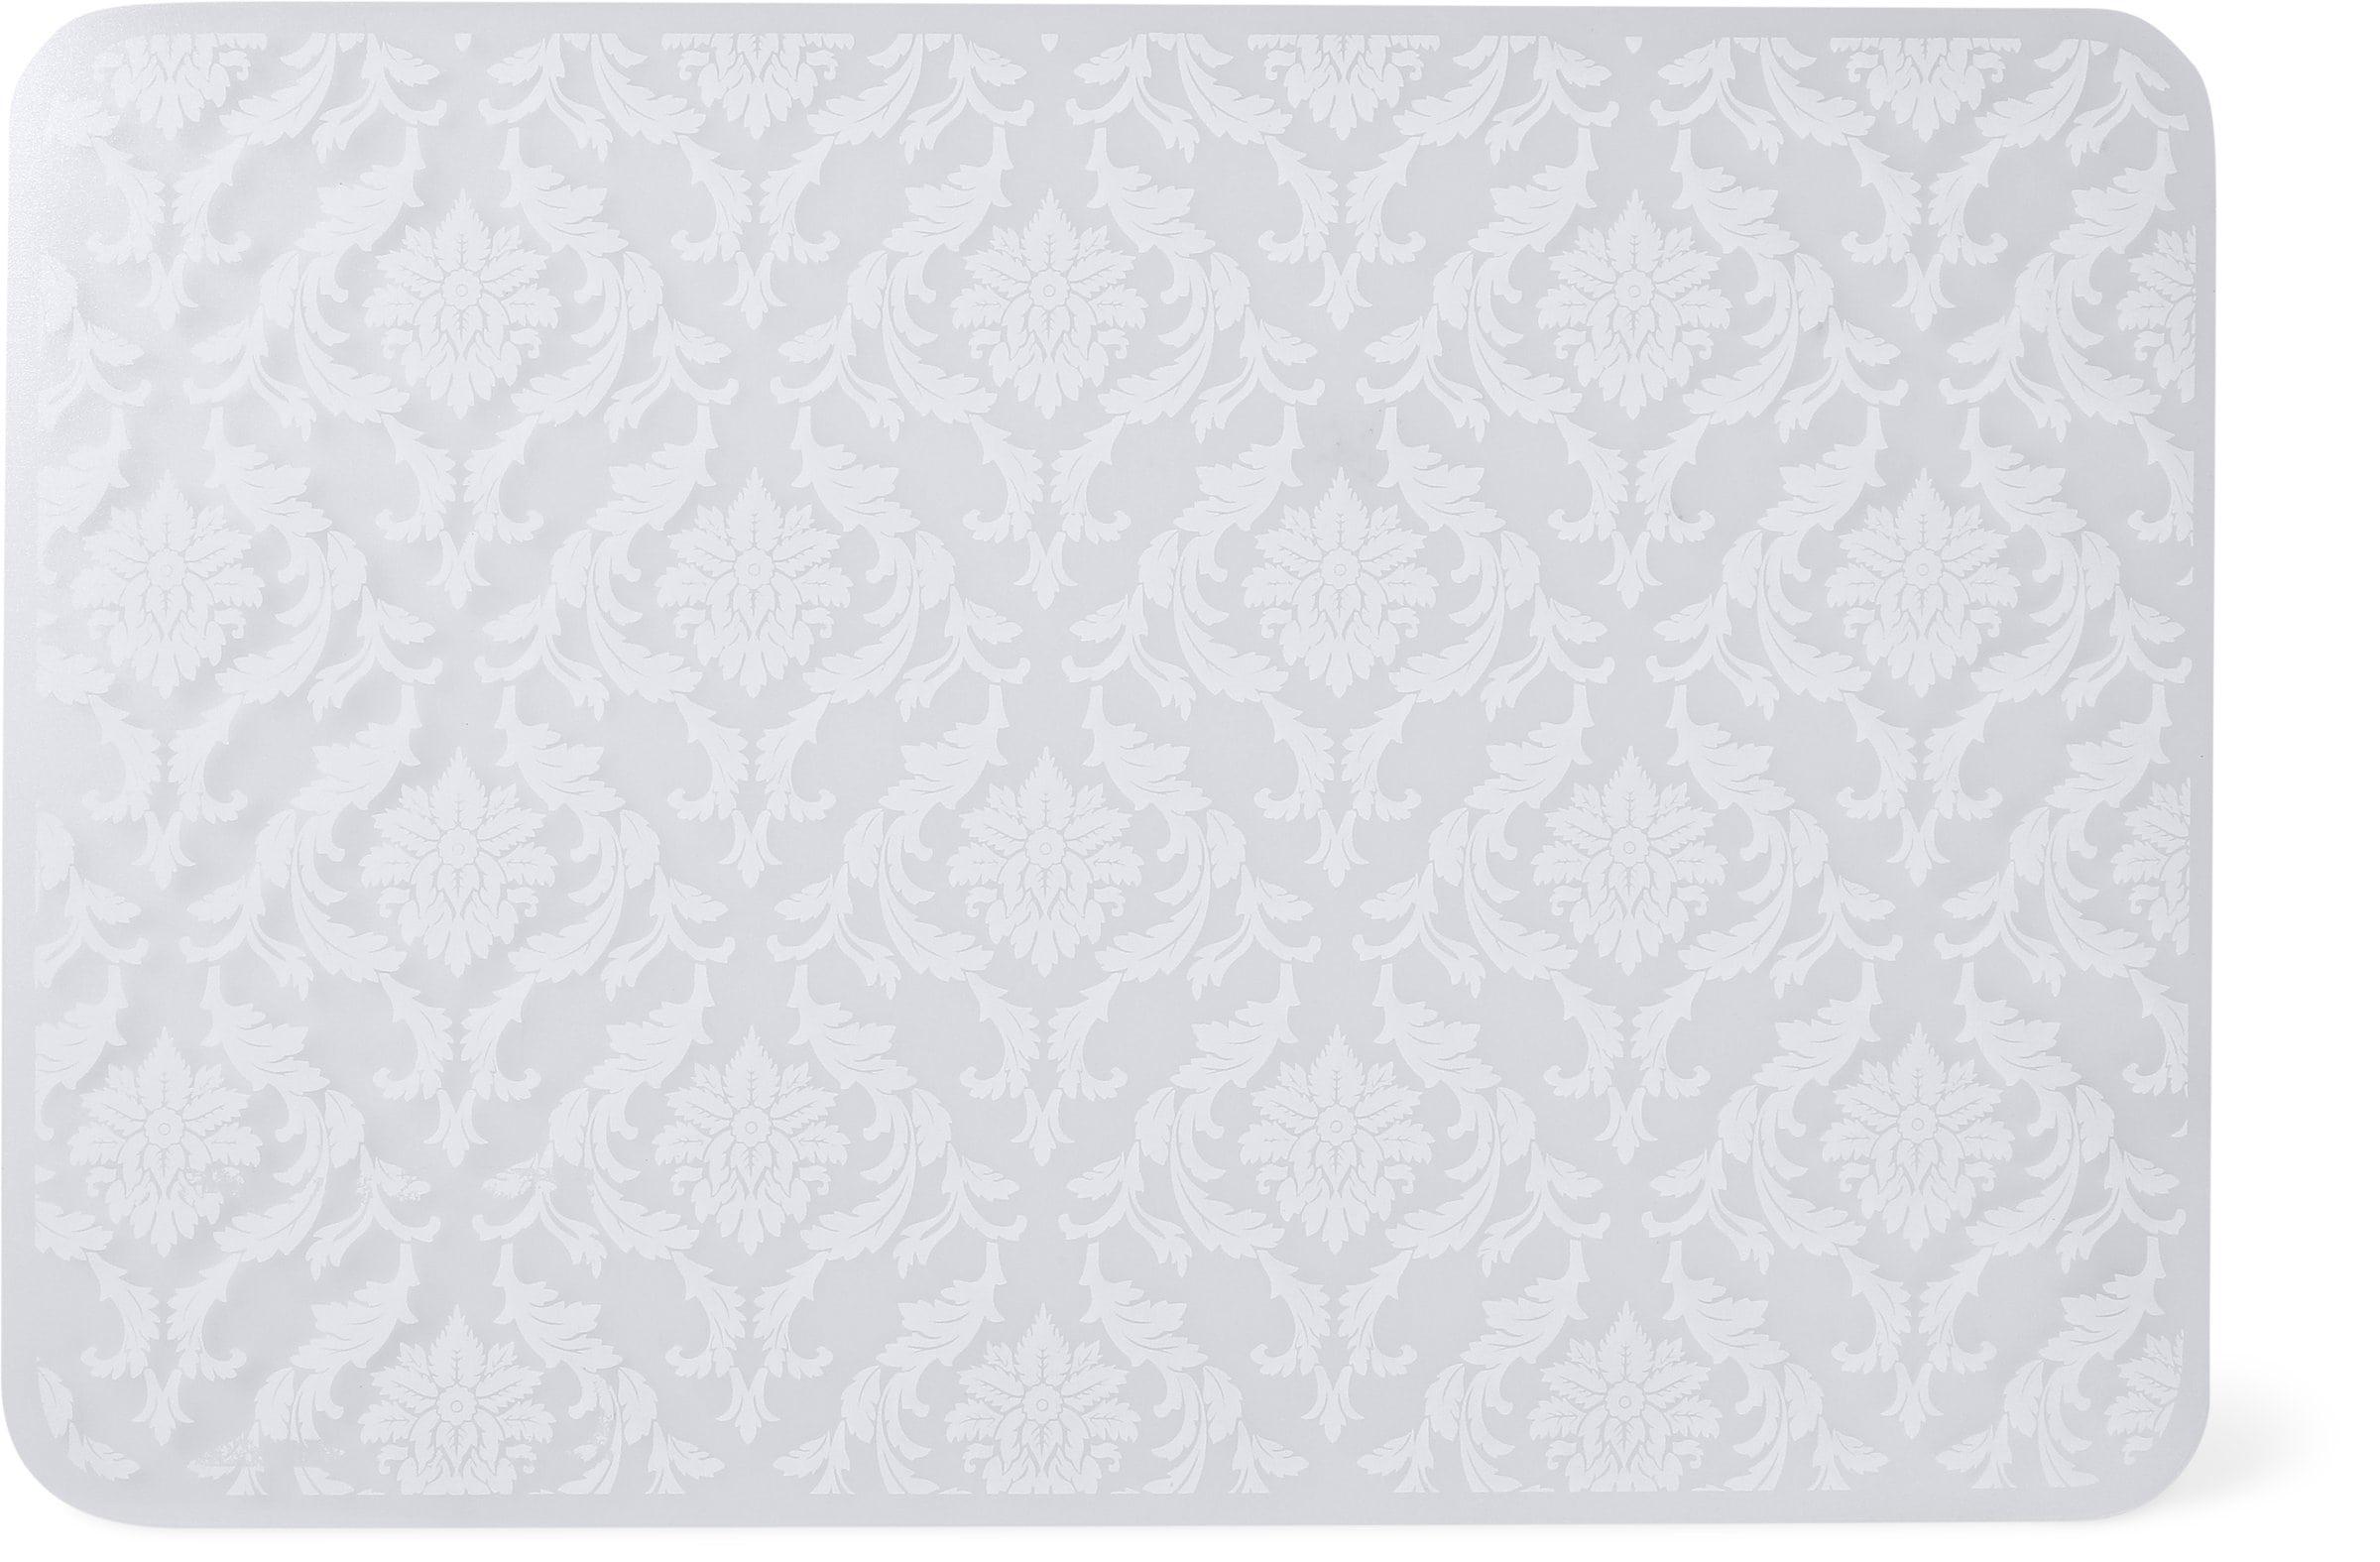 Cucina & Tavola Ornament Tischset